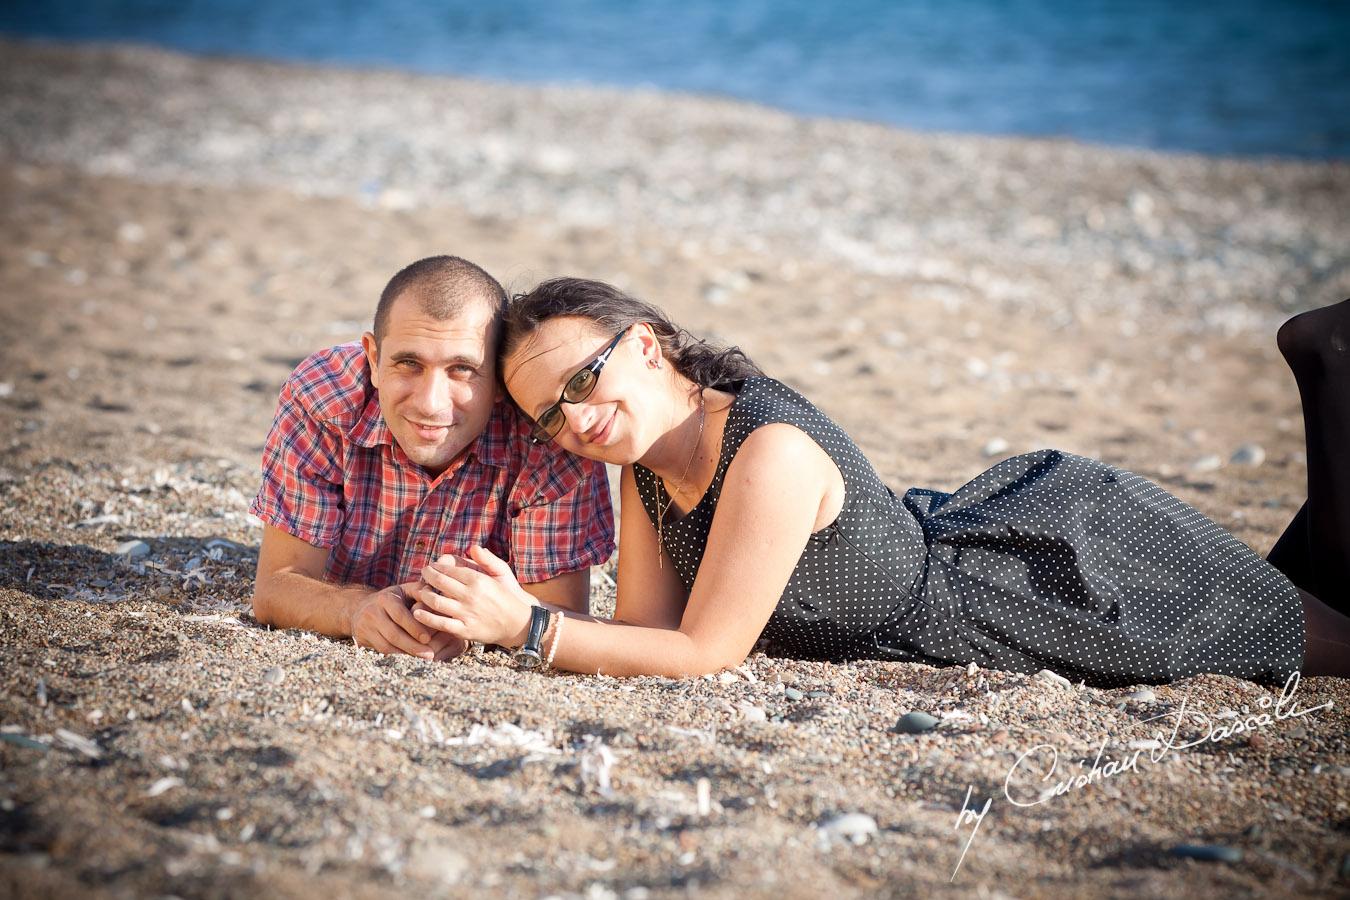 Tudor and Alina - Paramali Beach. Cyprus Photographer: Cristian Dascalu